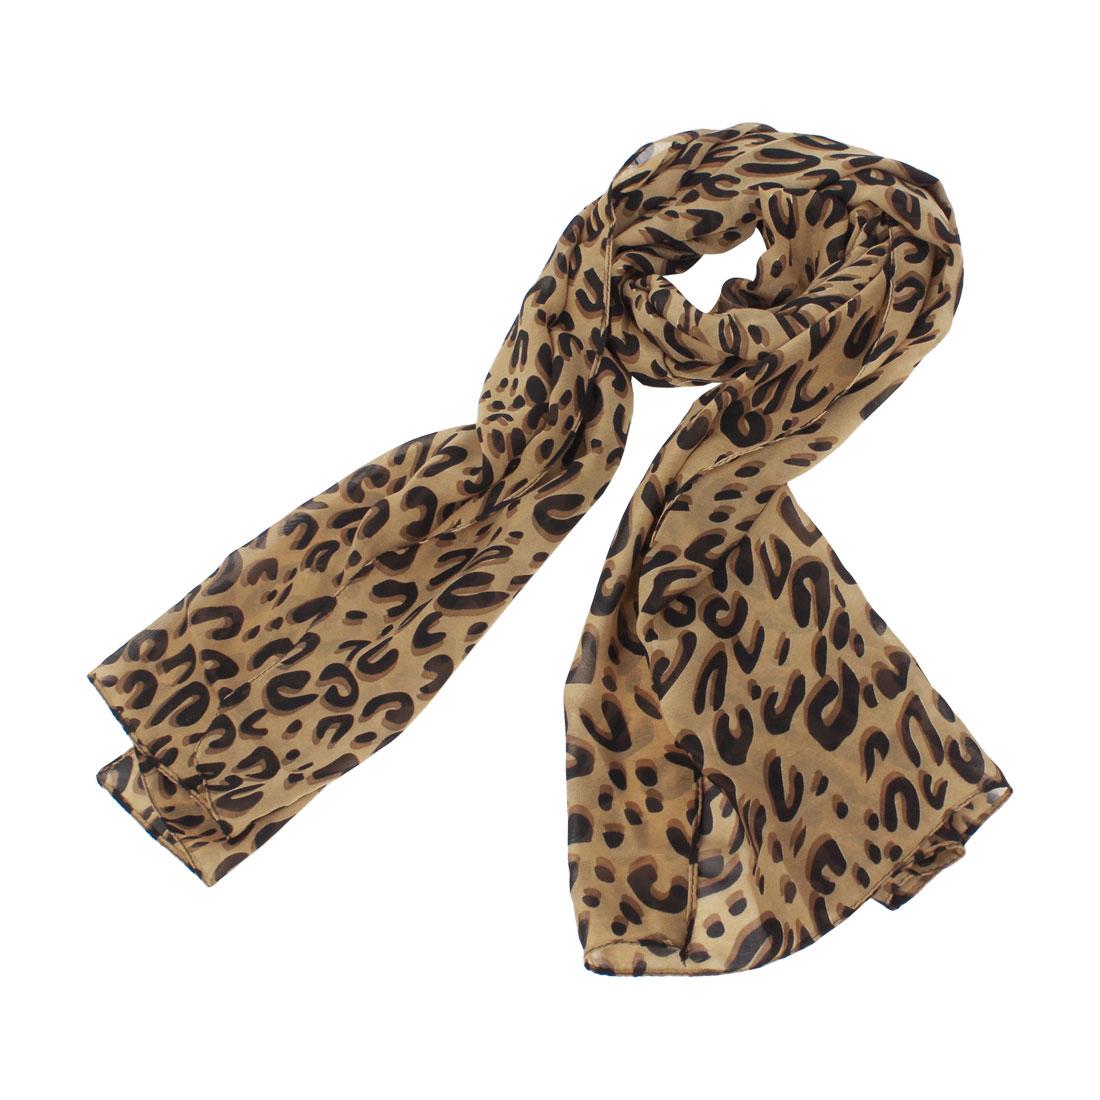 Leopard Pattern Semi-sheer Neck Scarf Wrap Neckerchief Brown Black